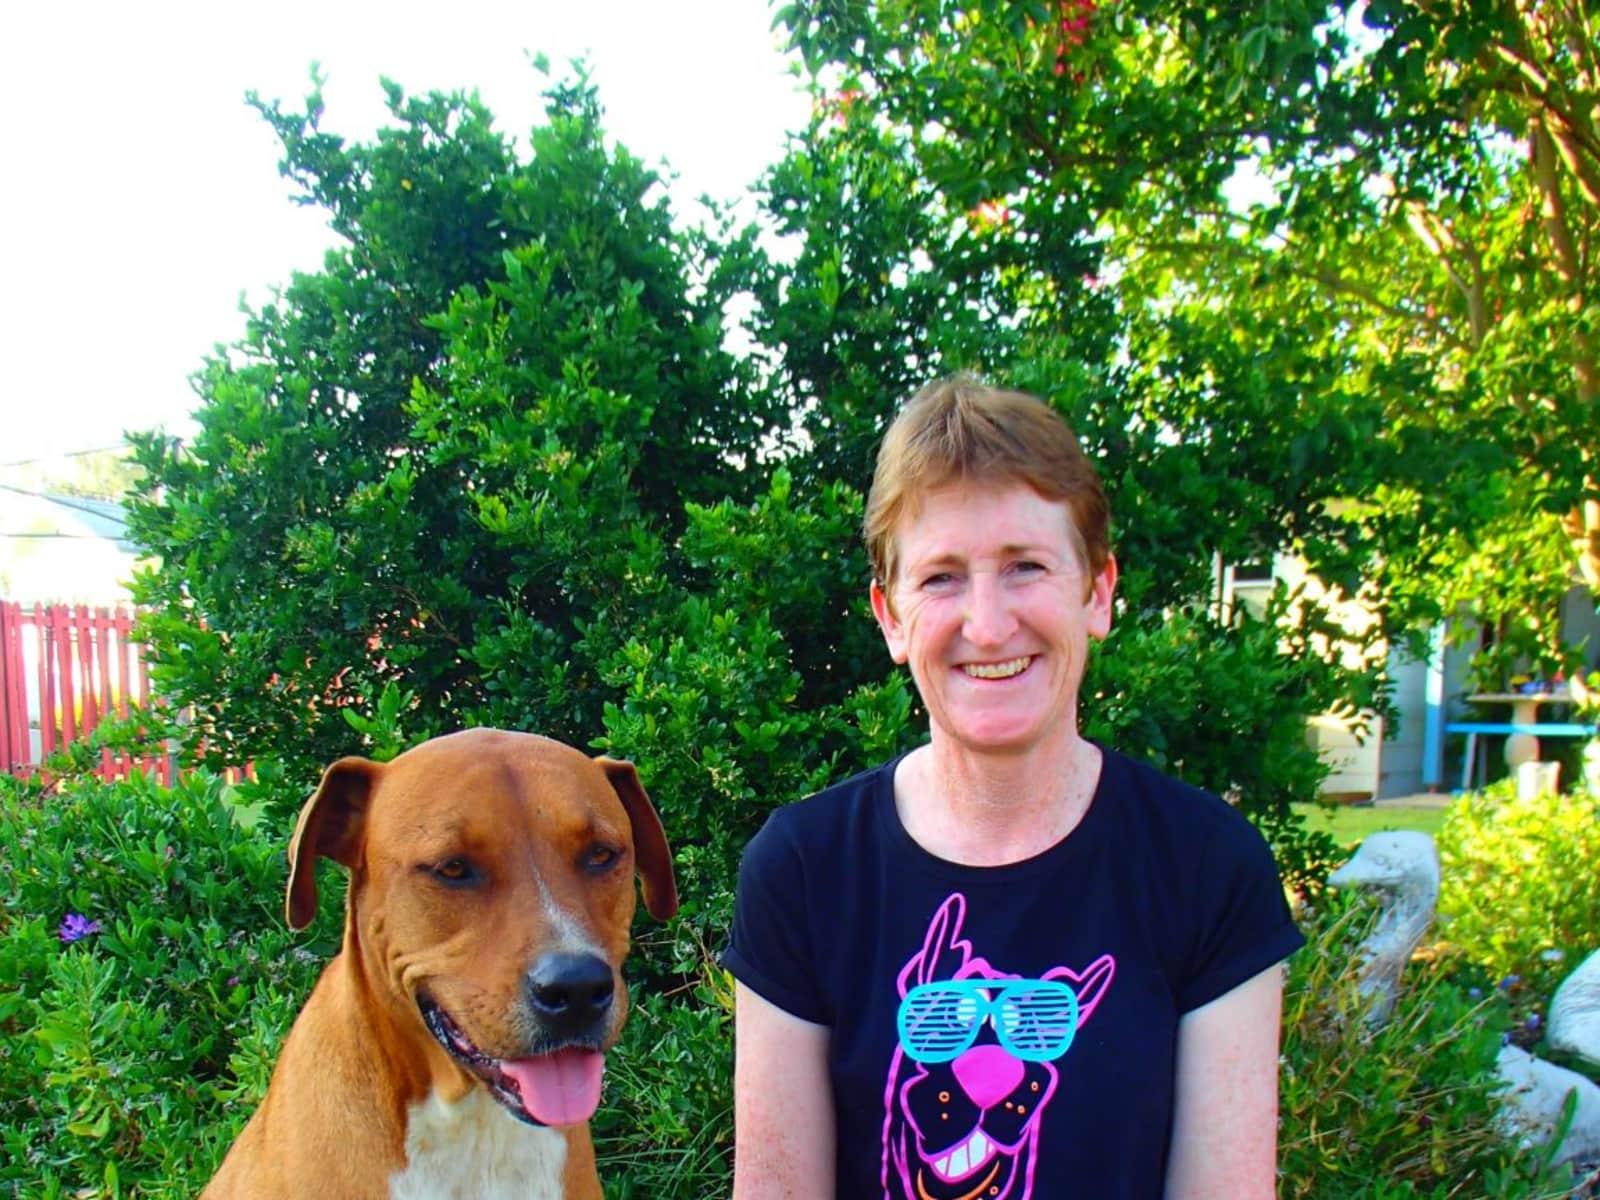 Kathy from Rockhampton, Queensland, Australia